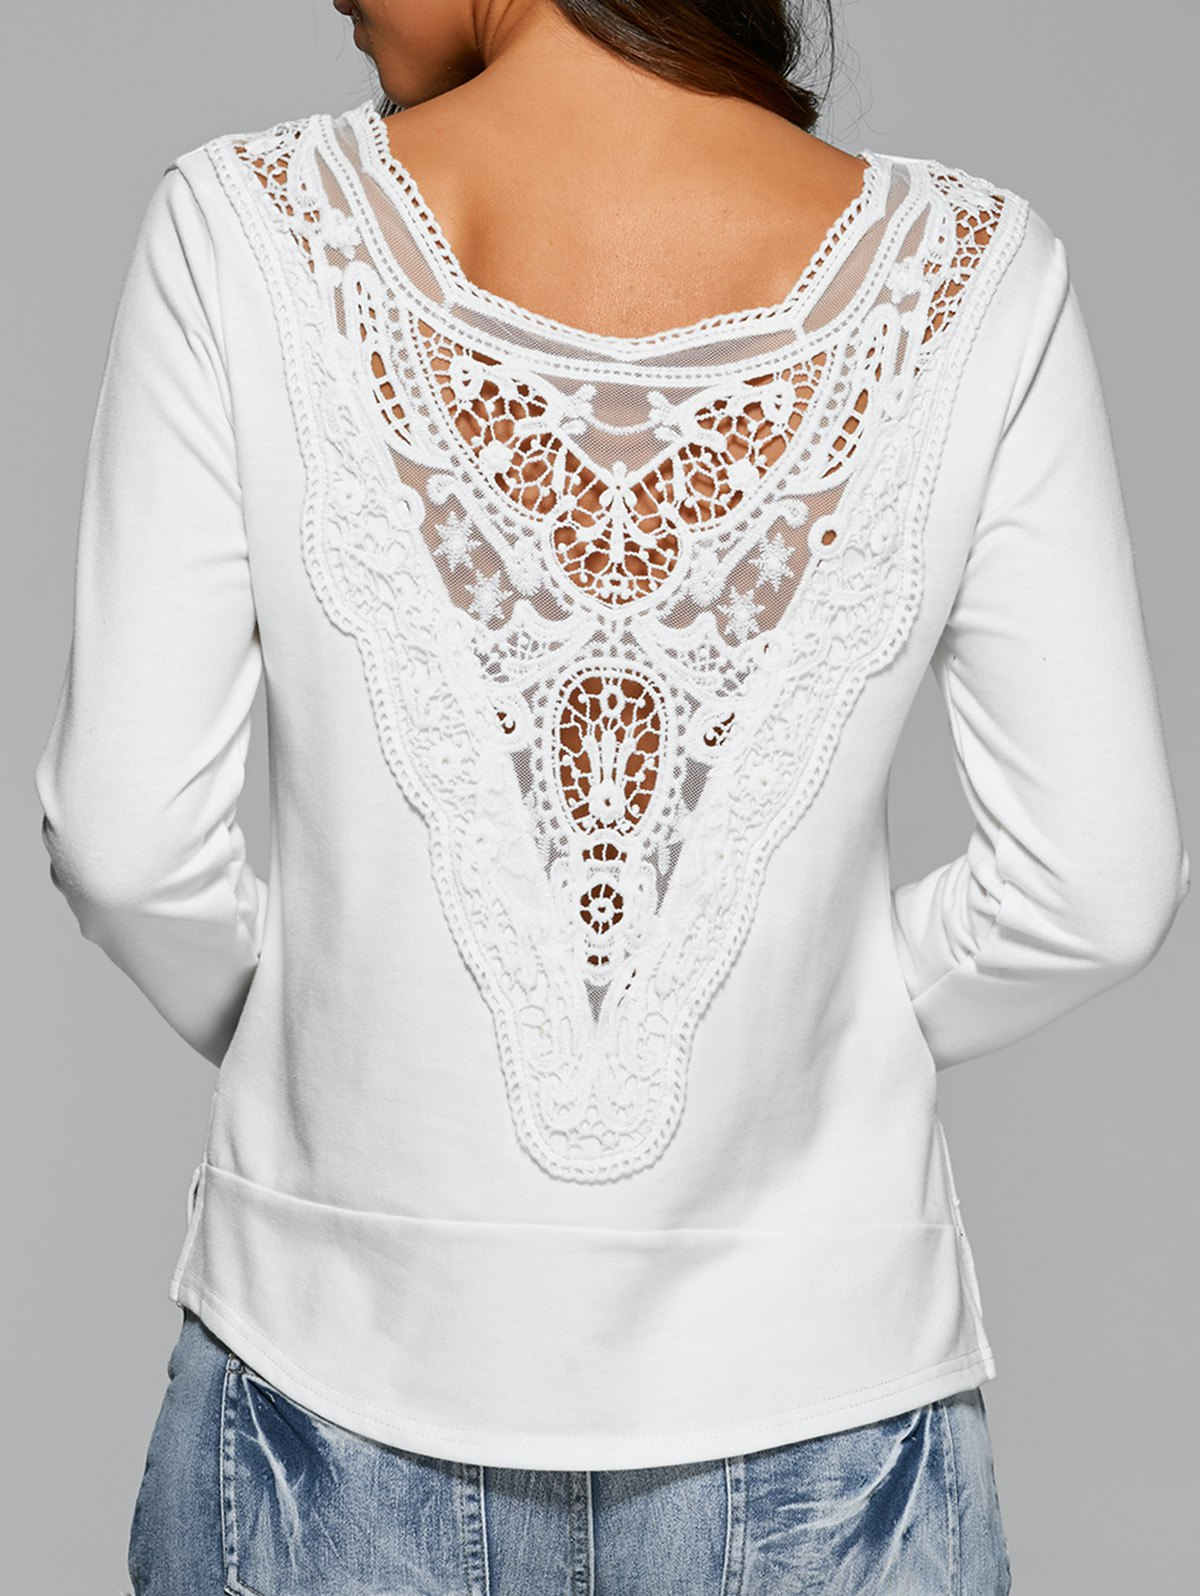 Long Sleeve Lace Back T-Shirt